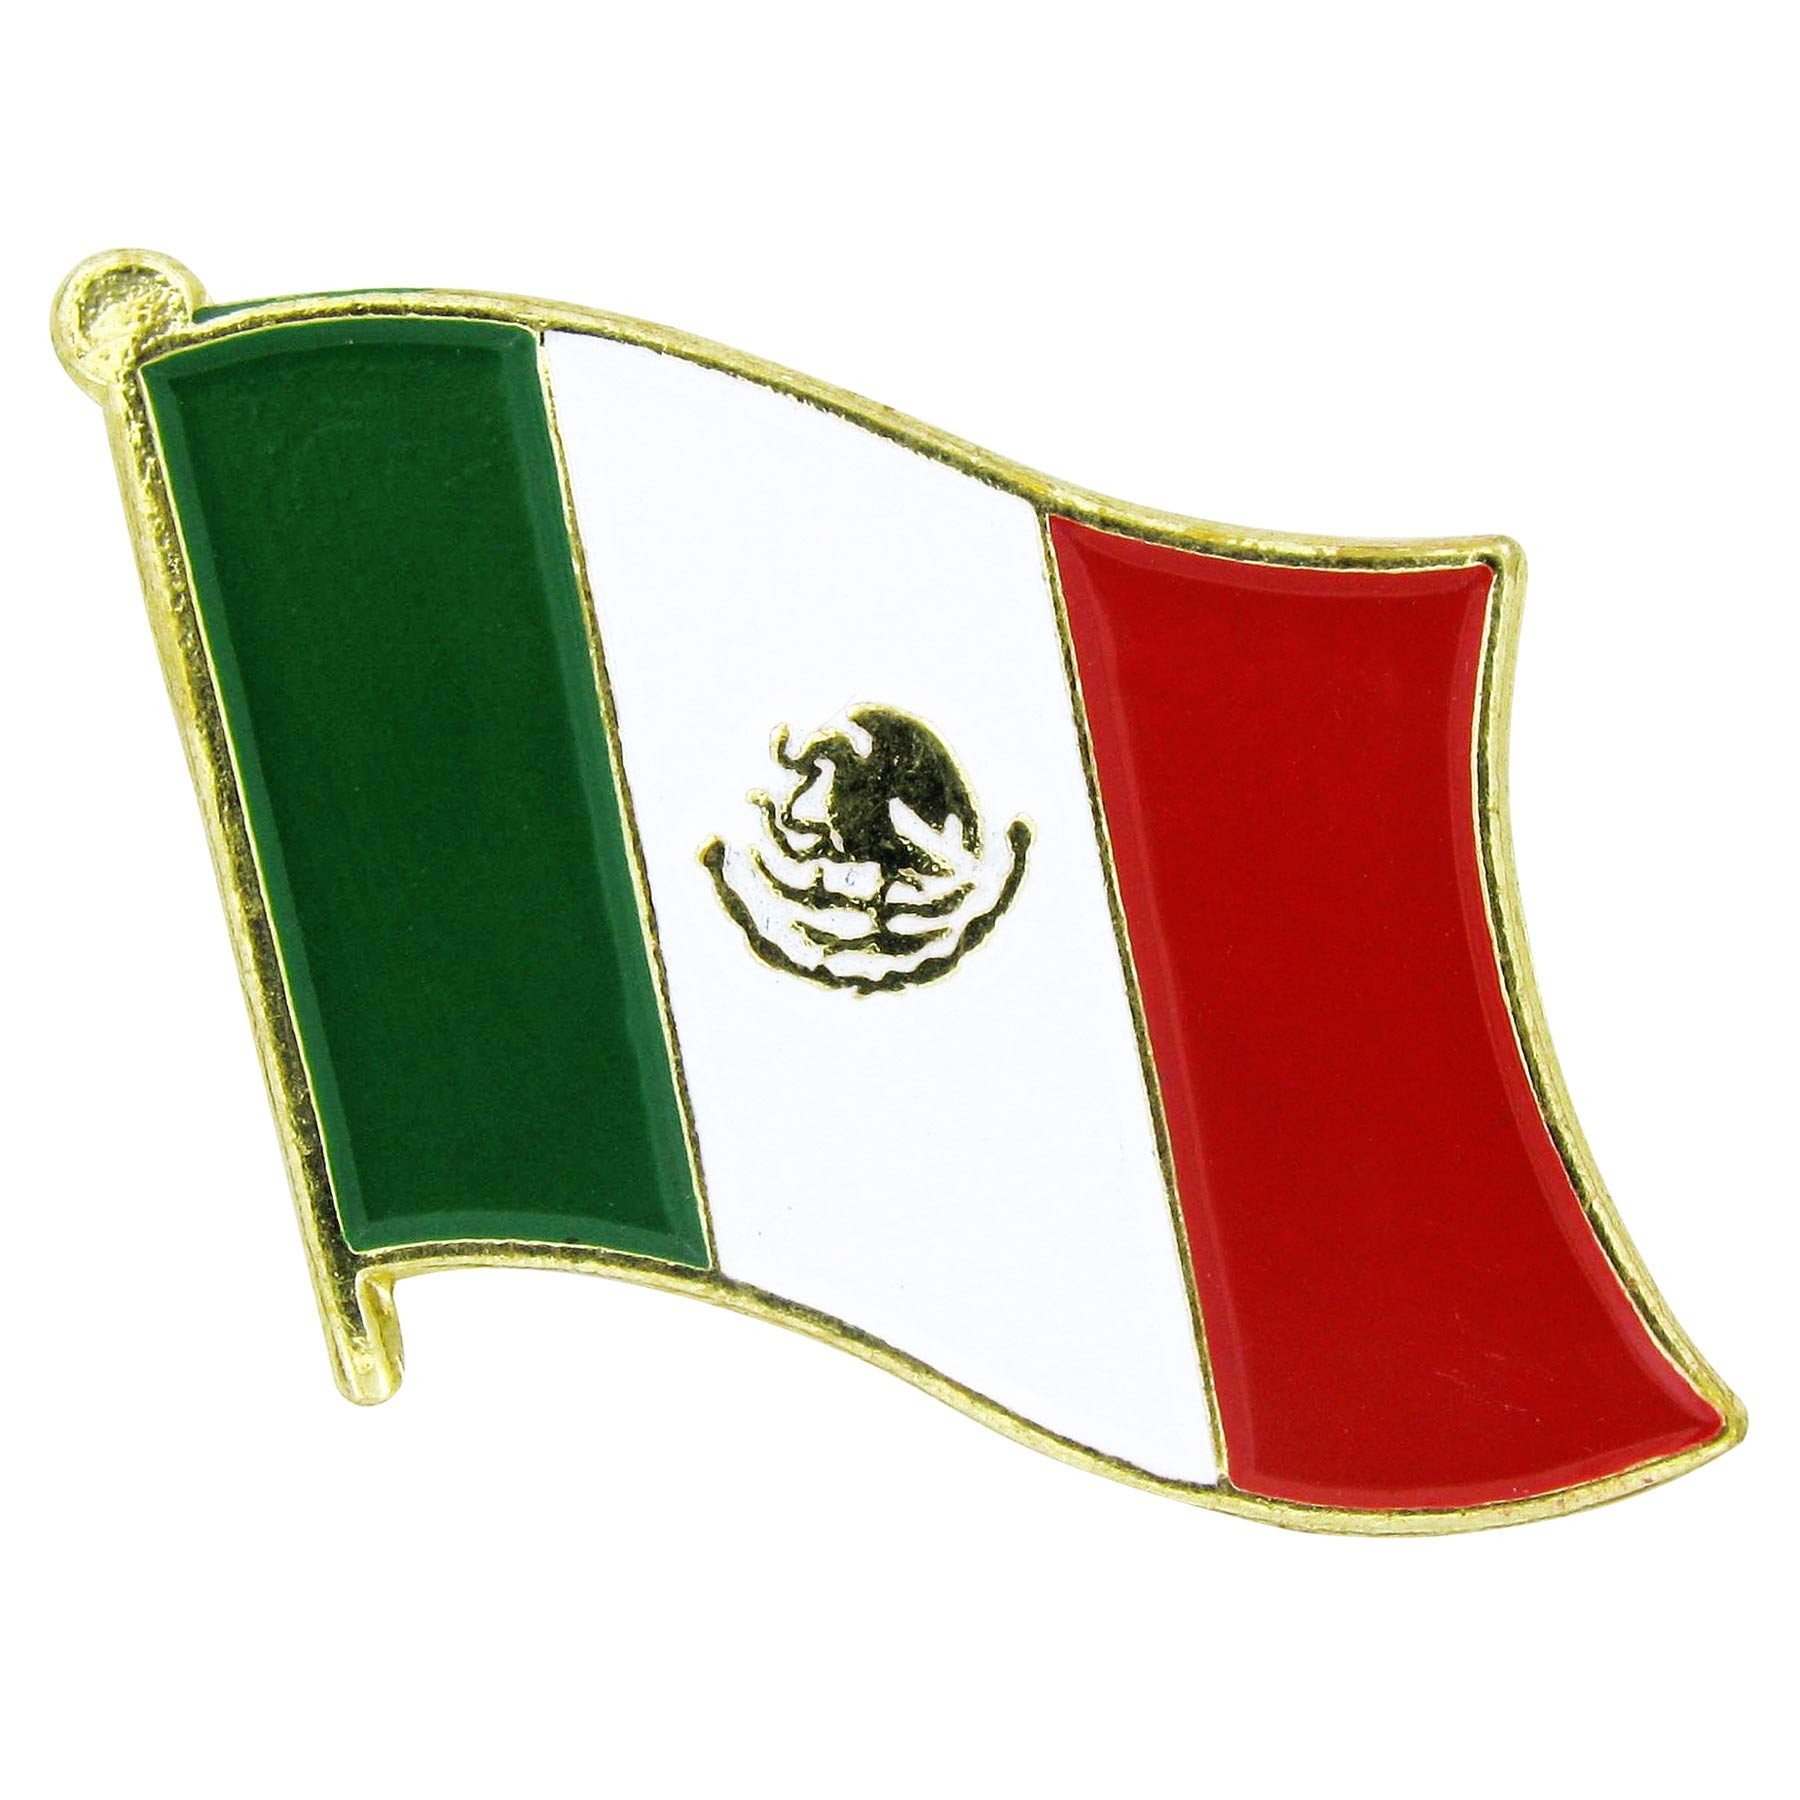 Mexican flag clipart 2